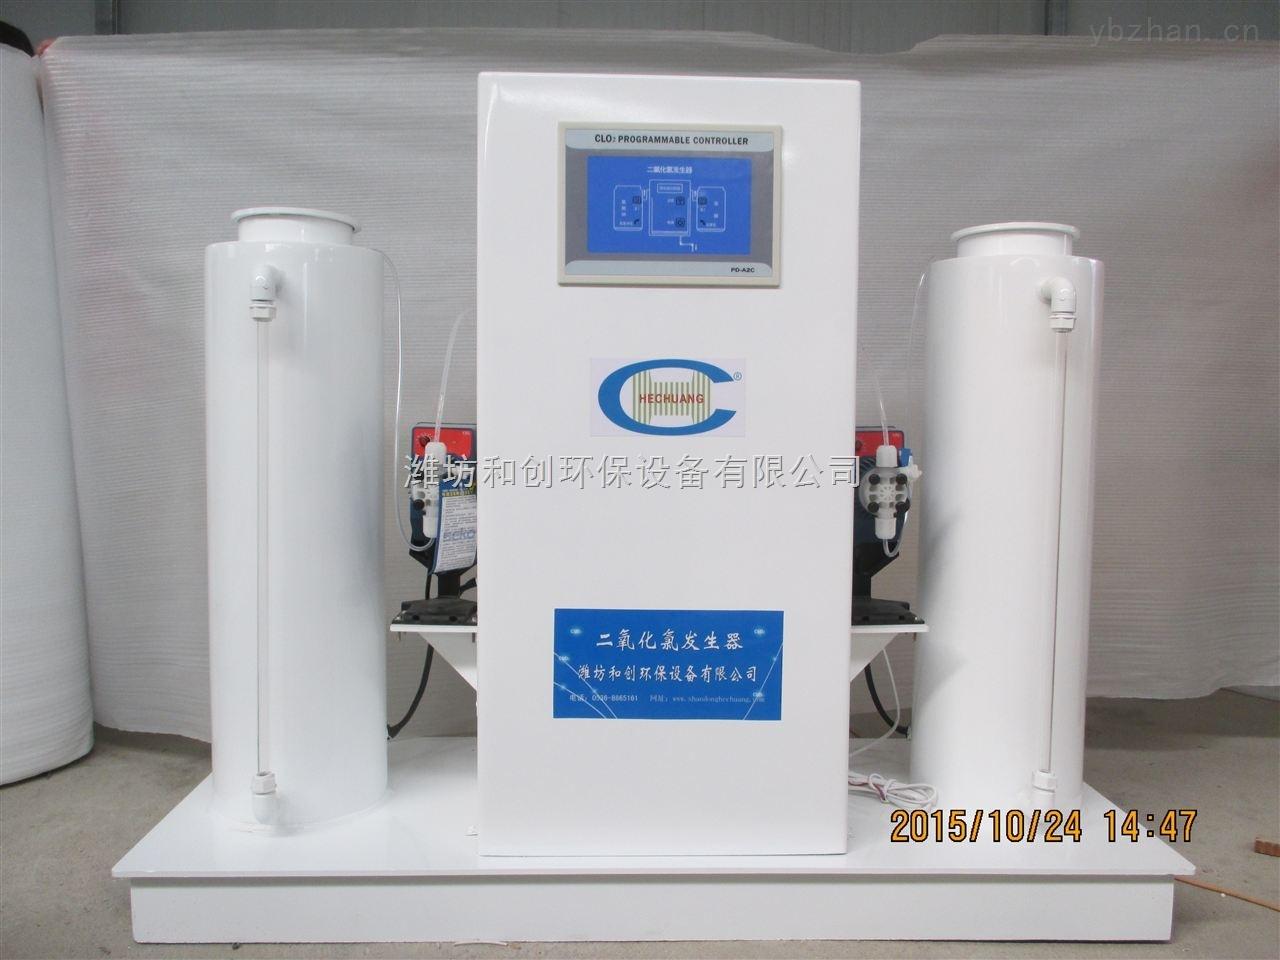 HCZY-湘潭市醫院污水處理二氧化氯發生器消毒設備